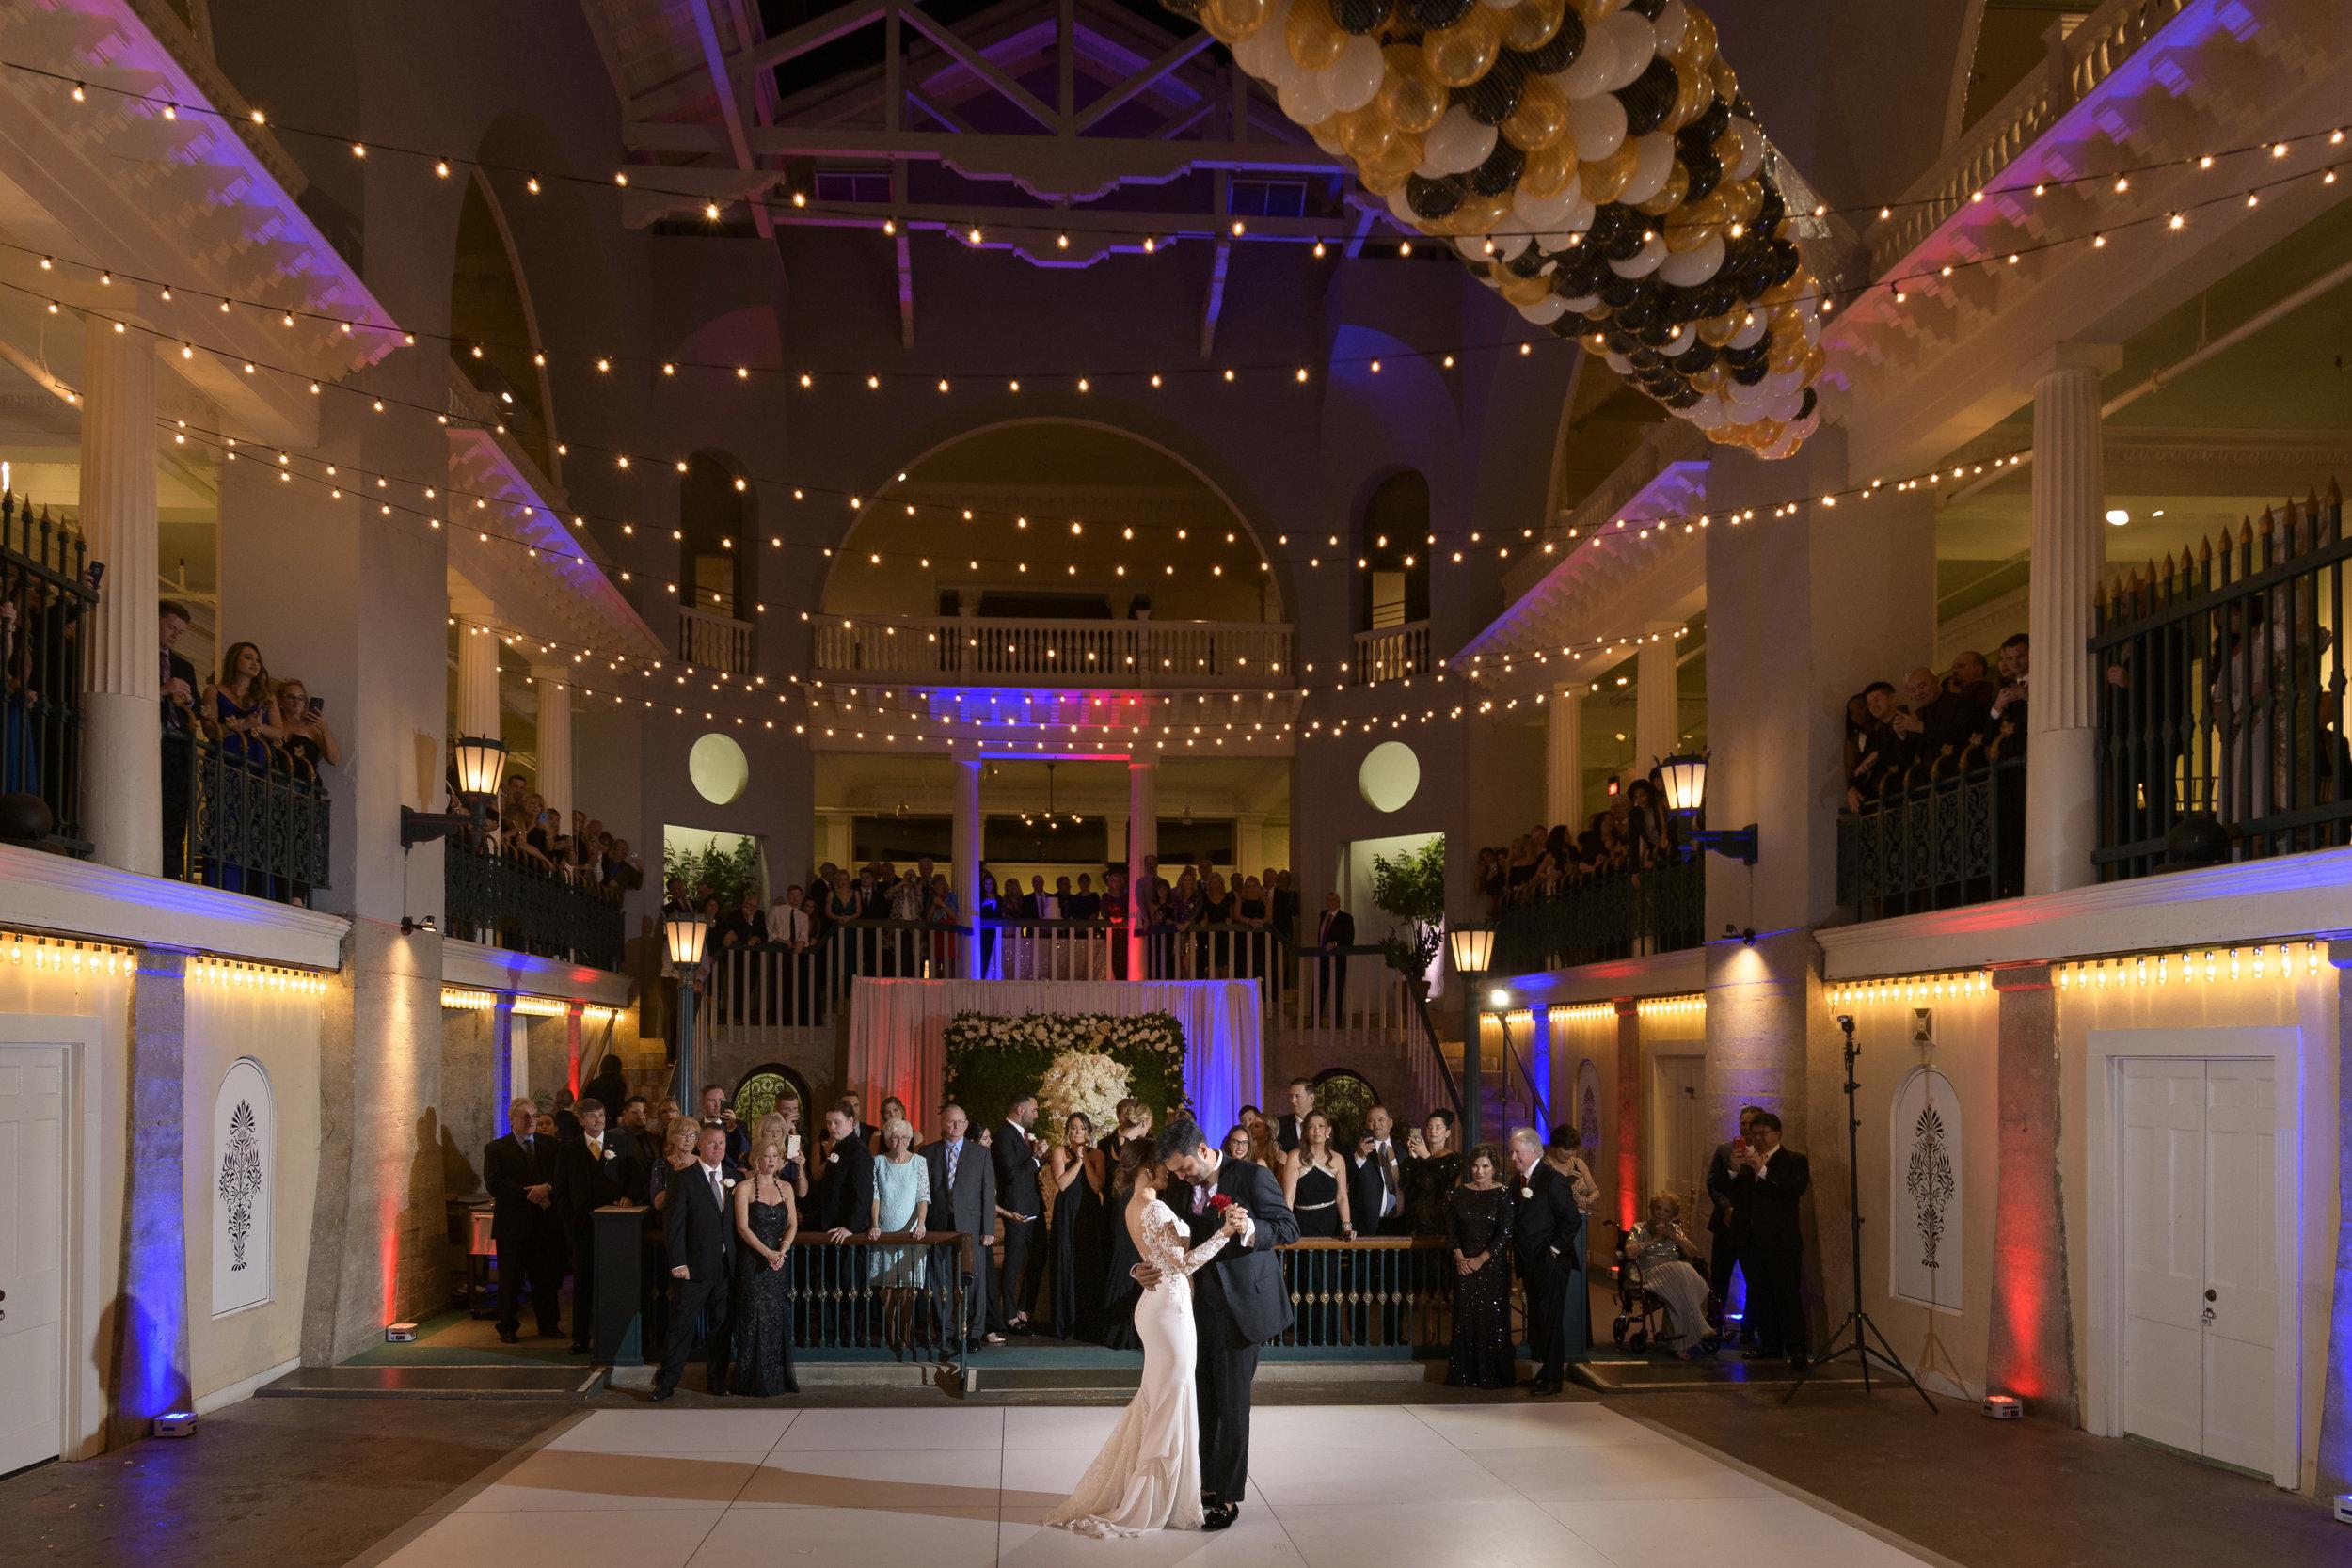 477-Monarch19-Wedding-Carris-DSC_1531.jpg